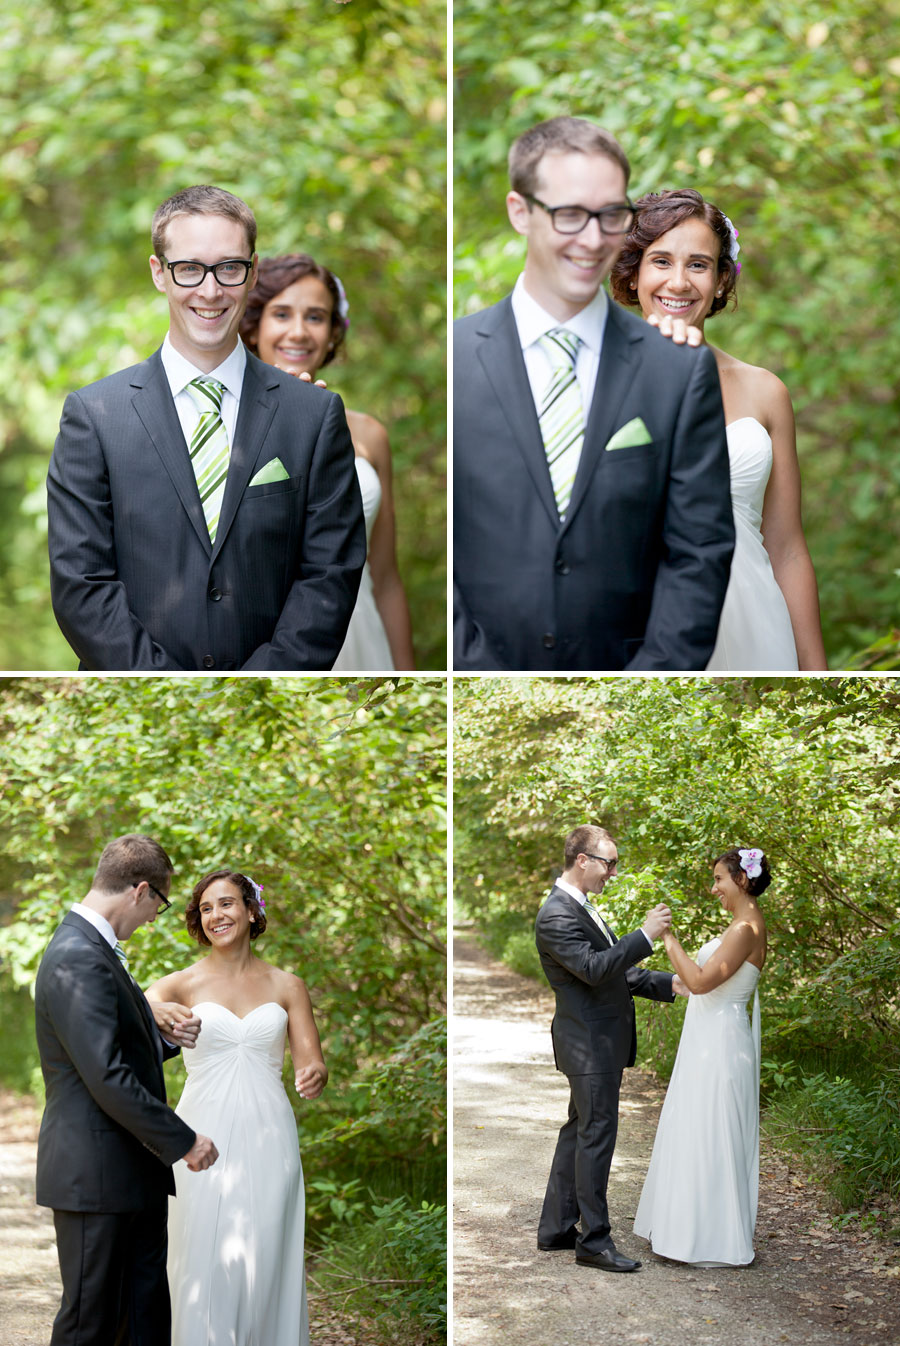 Toronto-Island-Jewish-Wedding_015.jpg